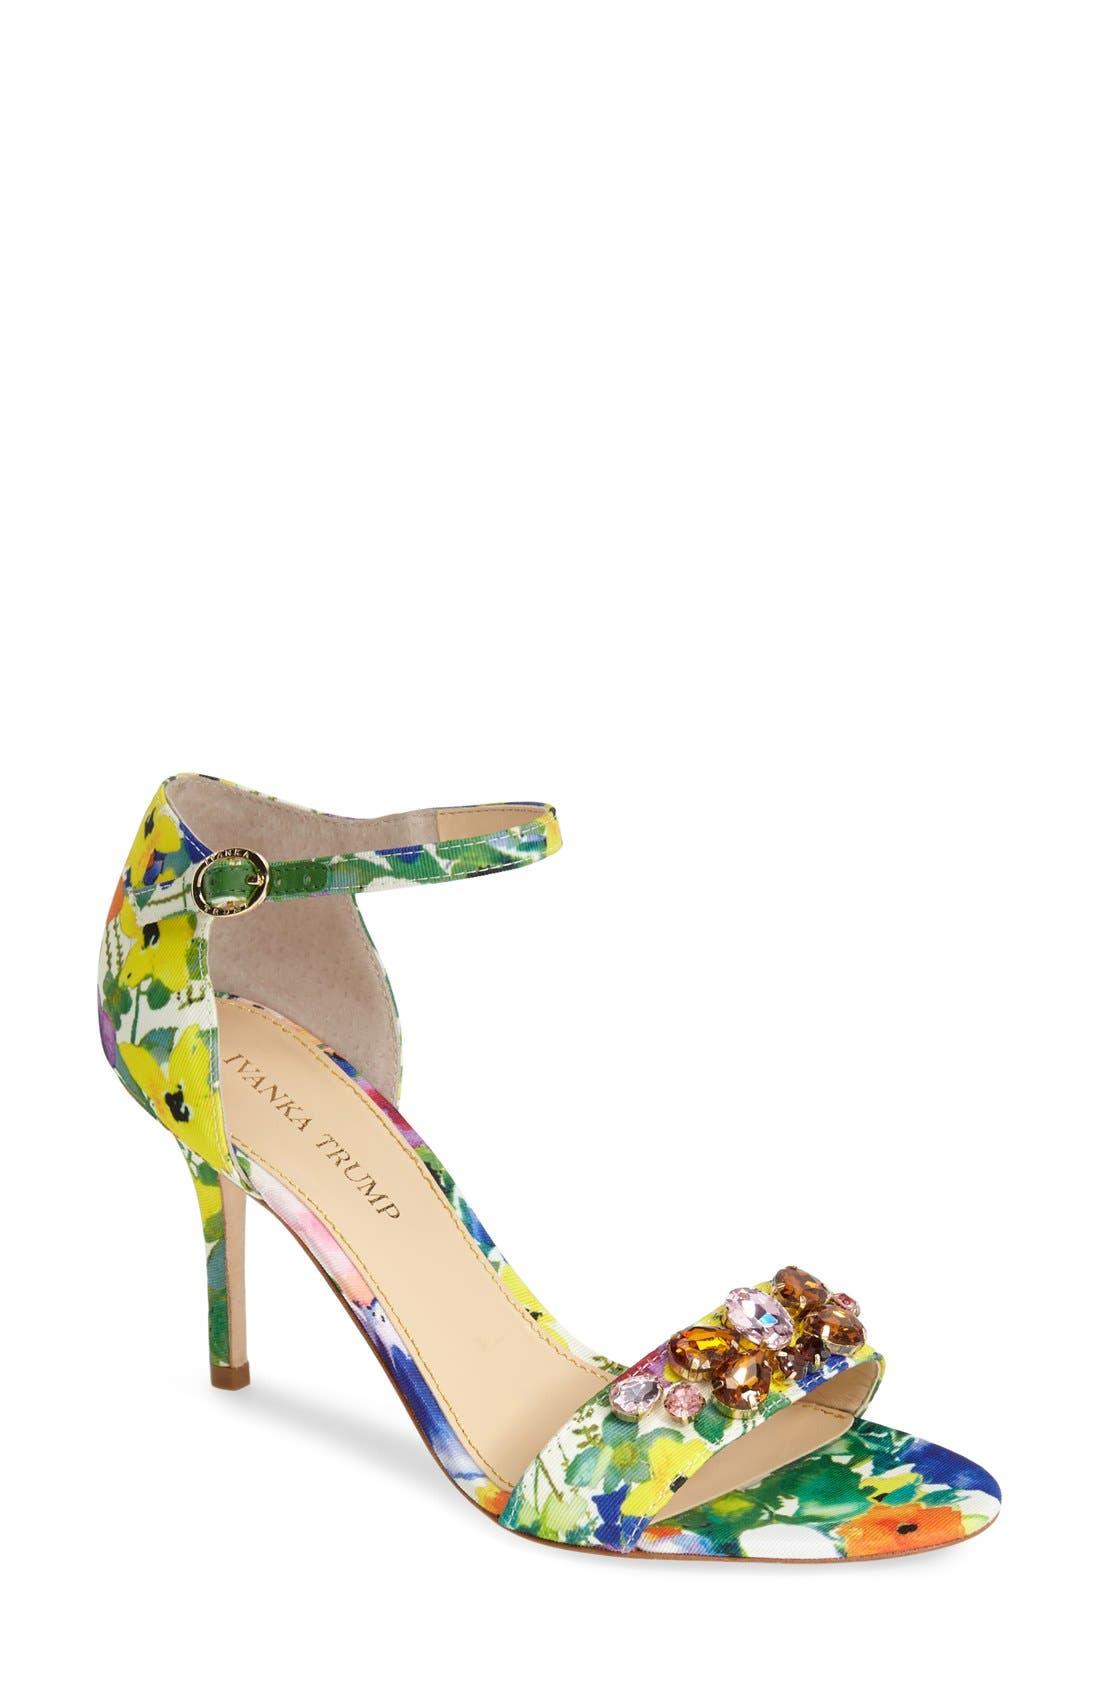 Alternate Image 1 Selected - Ivanka Trump 'Gessa' Crystal Embellished Print Sandal (Women)